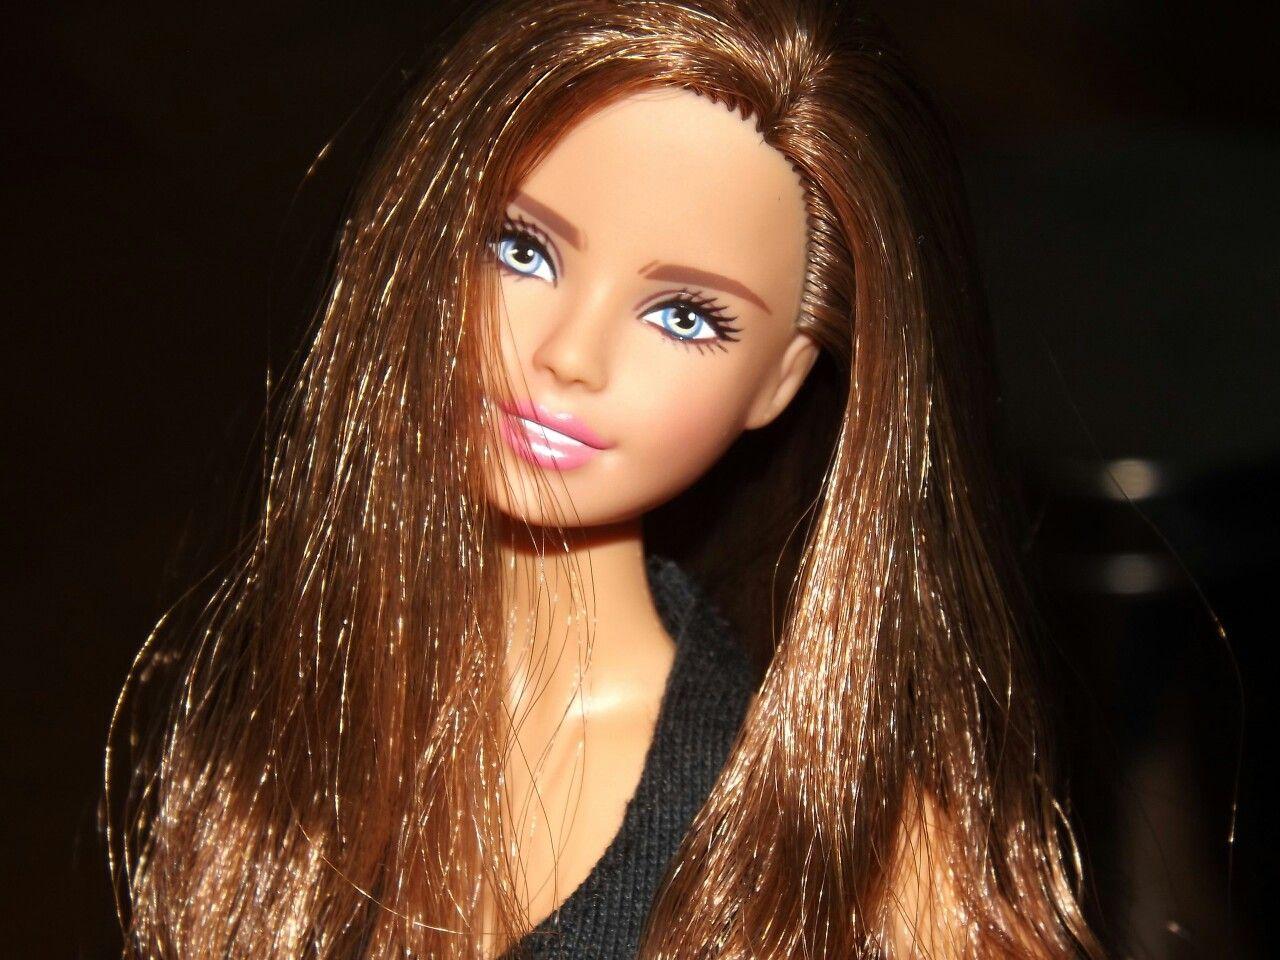 BarbieCollector University ofOklahoma